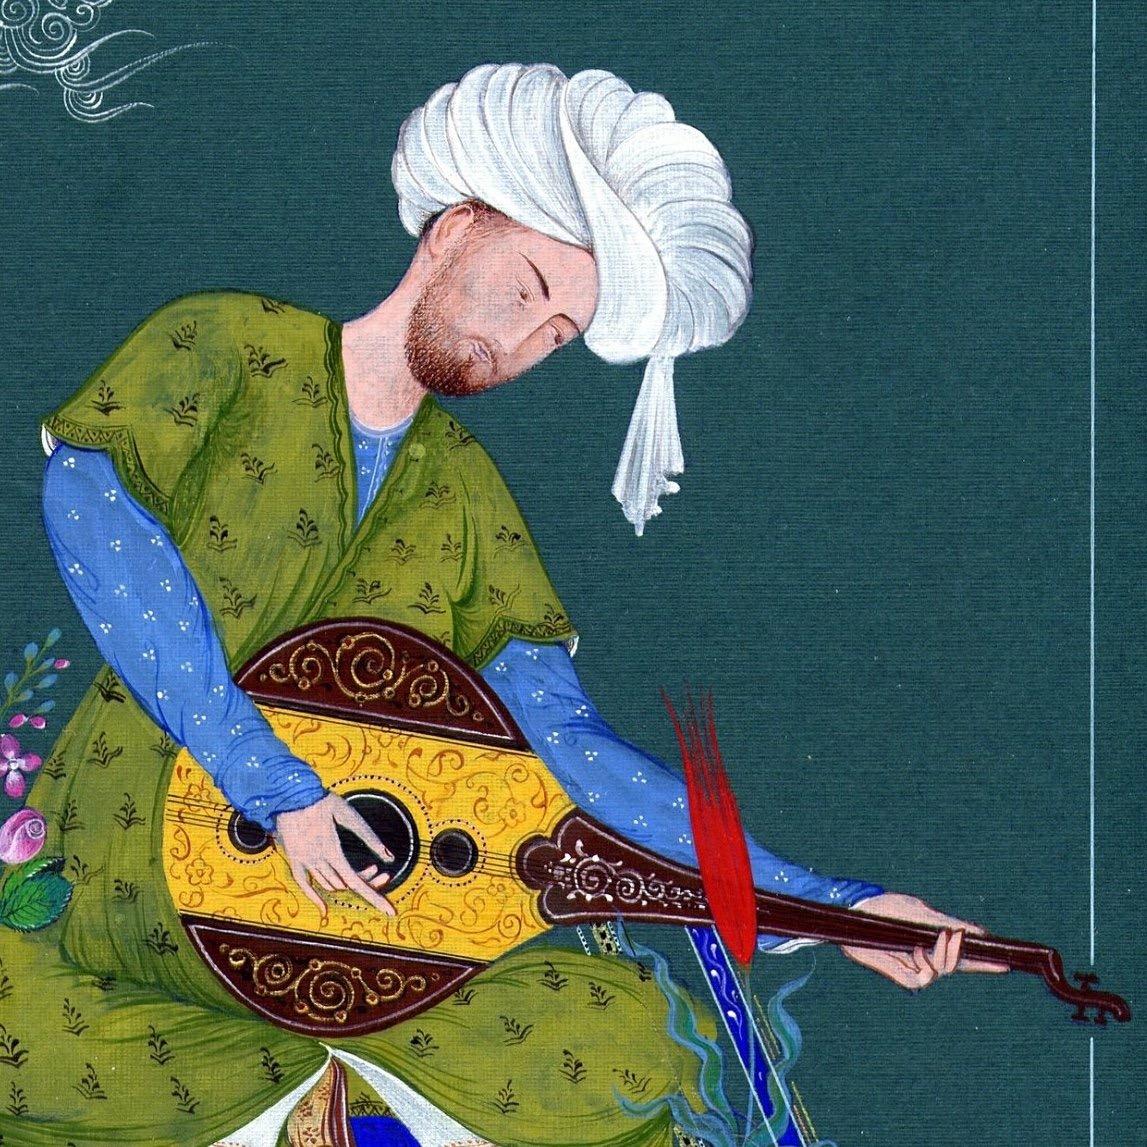 https://www.saphirnews.com/agenda/Musiques-spirituelles-du-monde-iranien-avec-Jean-During-Leyli-Atashkar-et-David-Alidad-During_ae573026.html